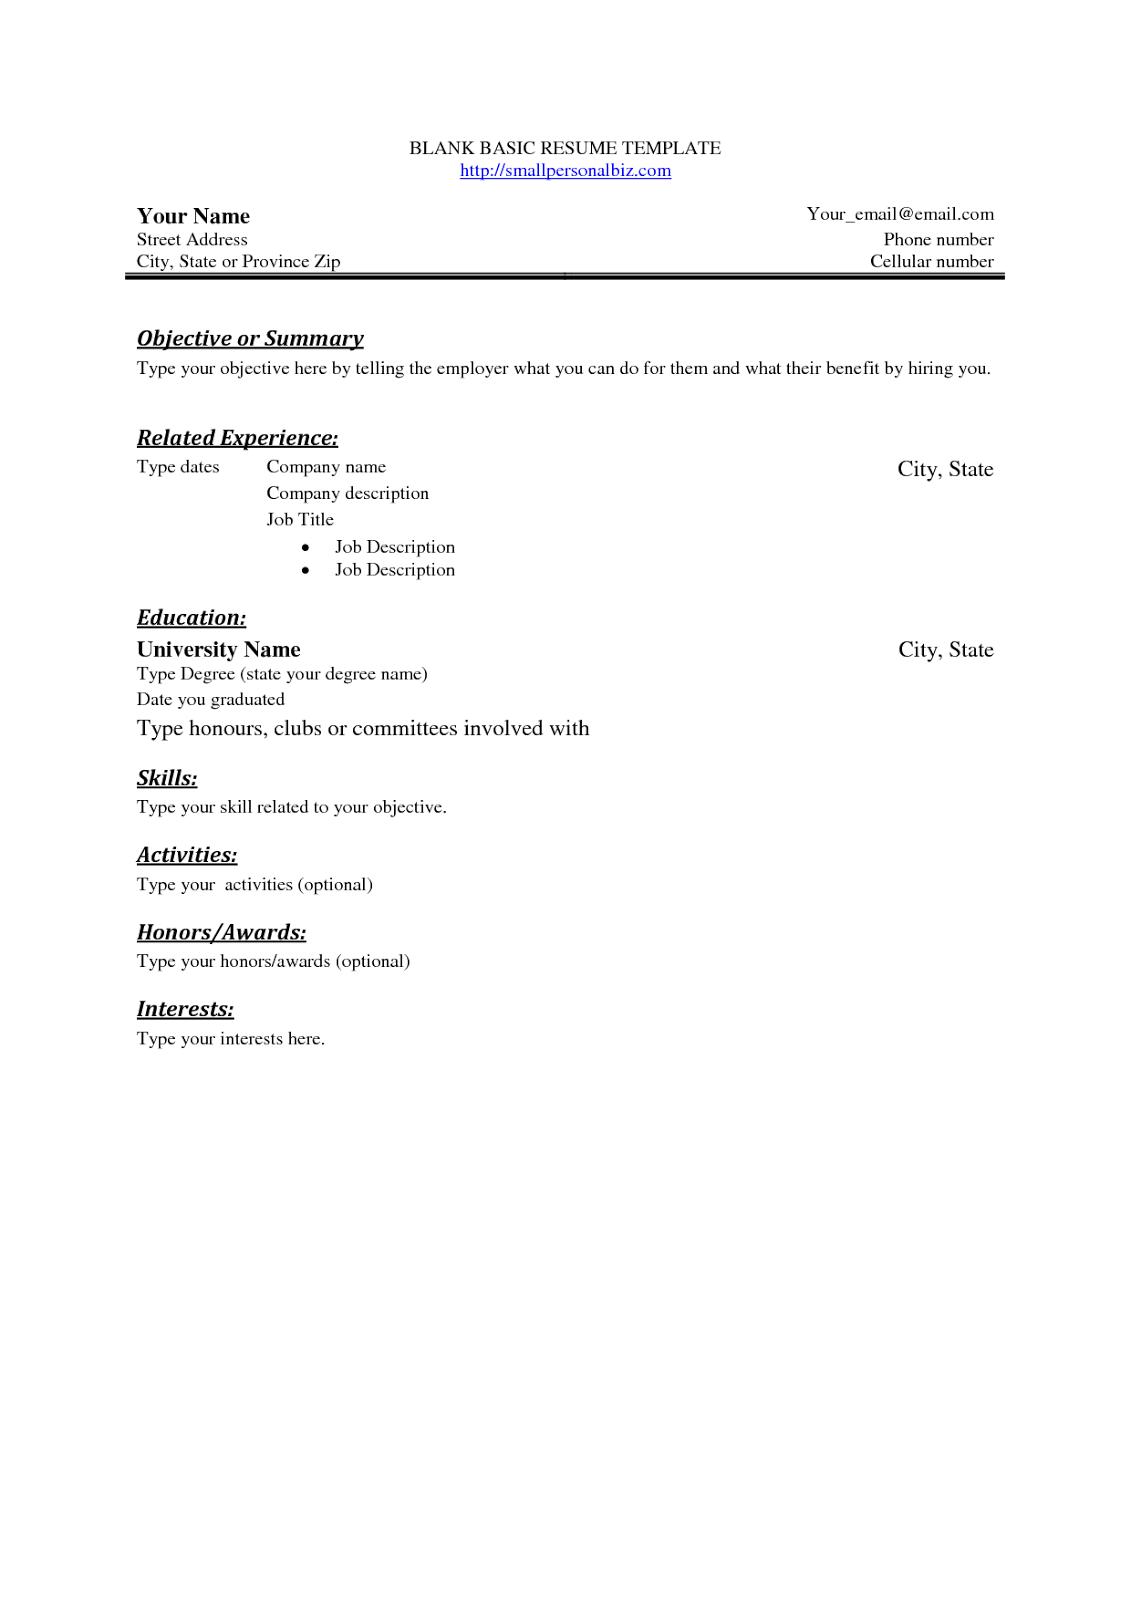 Saving College Students Free Homework Help Online blank resume